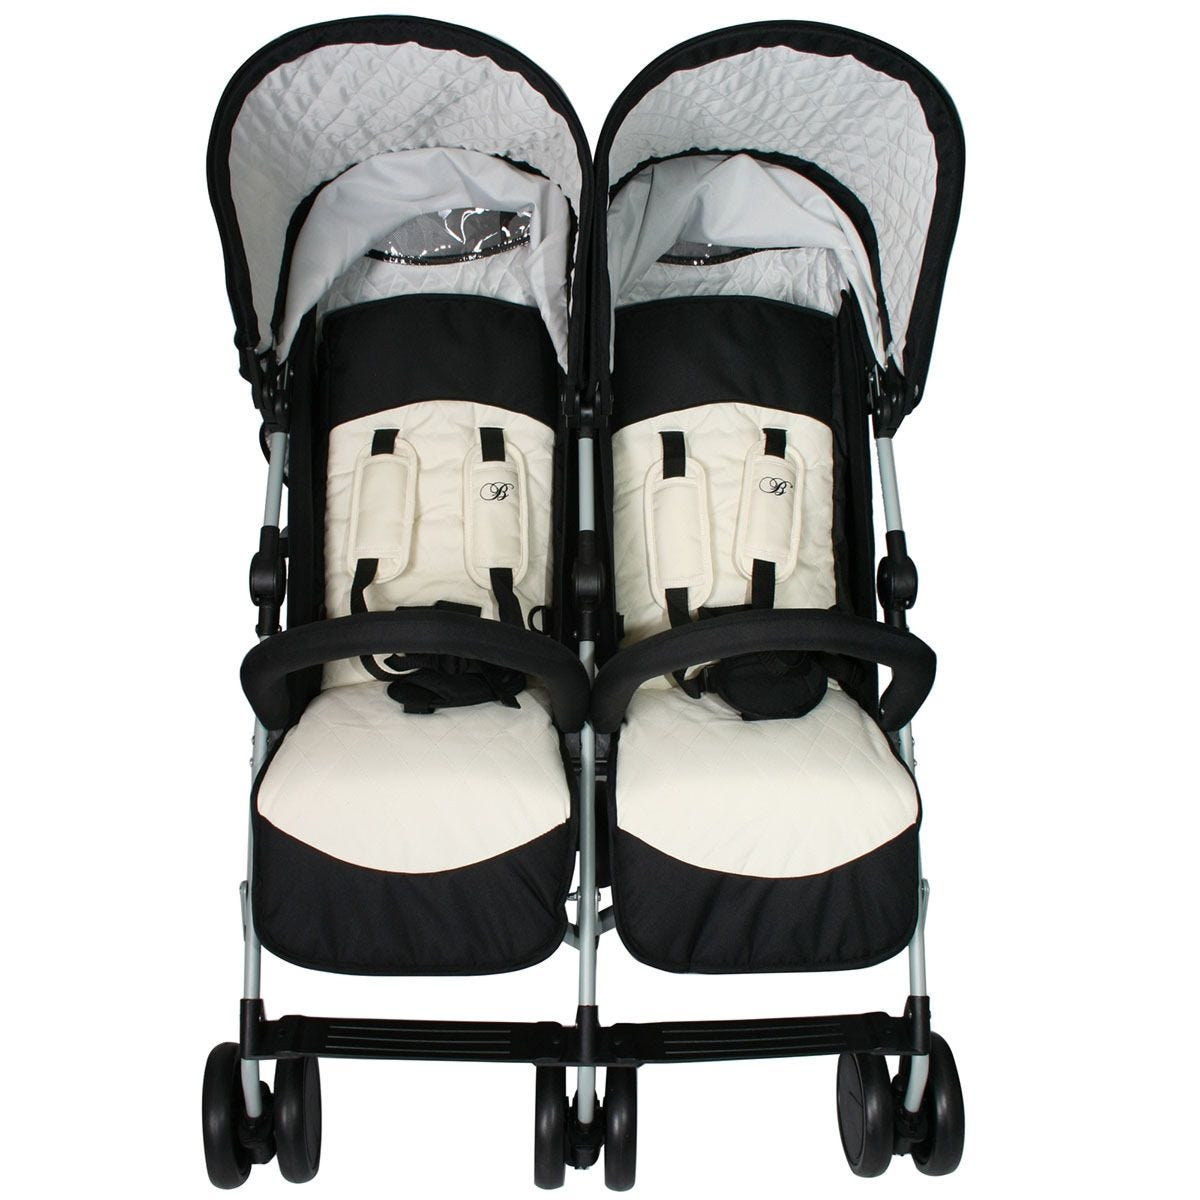 My Babiie Billie Faiers MB22 Double Stroller - Black & Cream